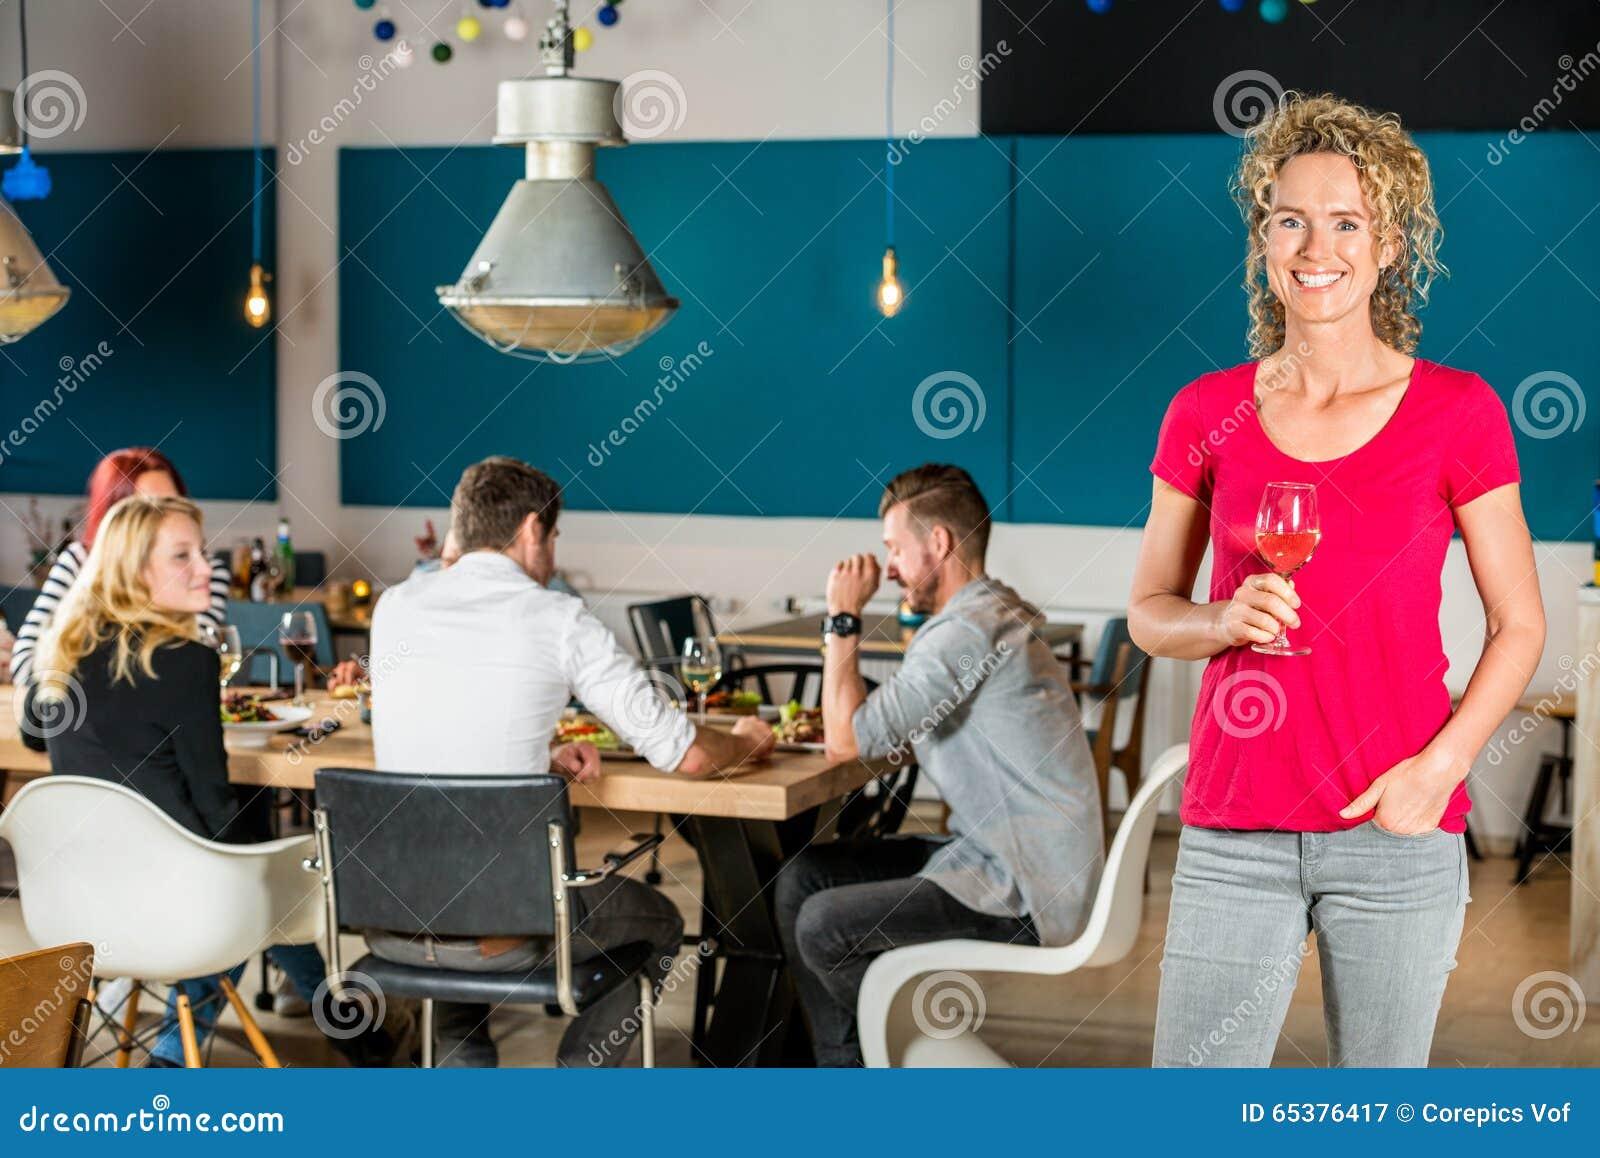 Beautiful Woman Holding Wineglass At Cafe